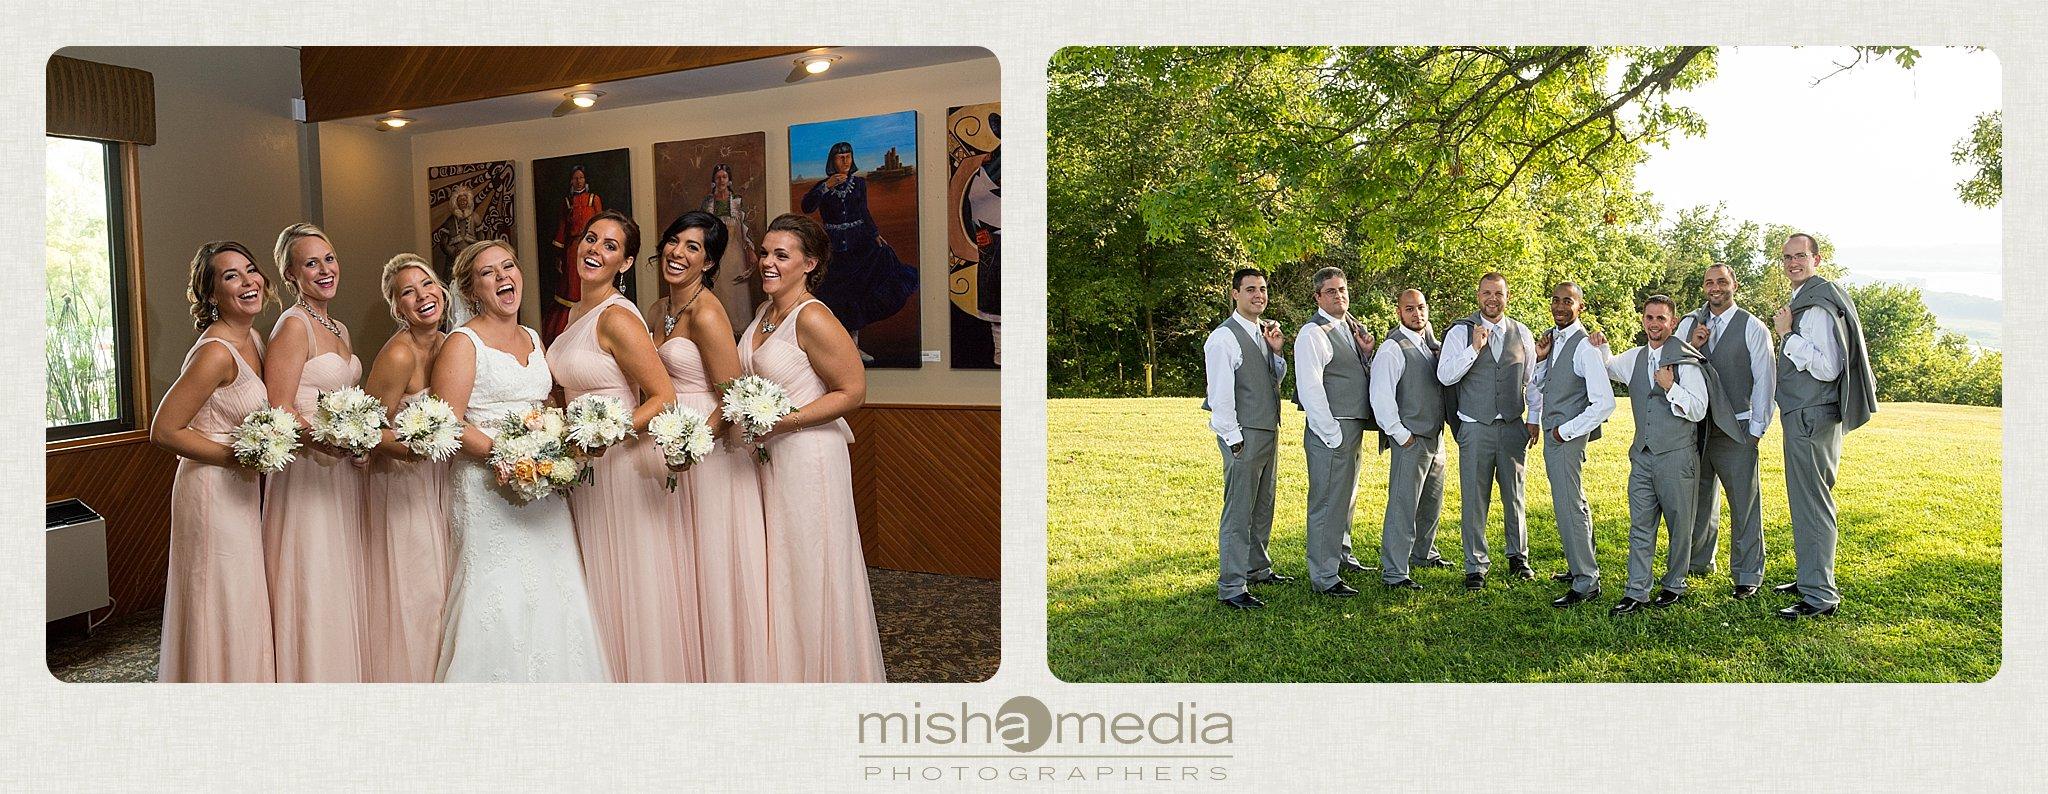 Weddings at Chestnut mountain Resort_0017